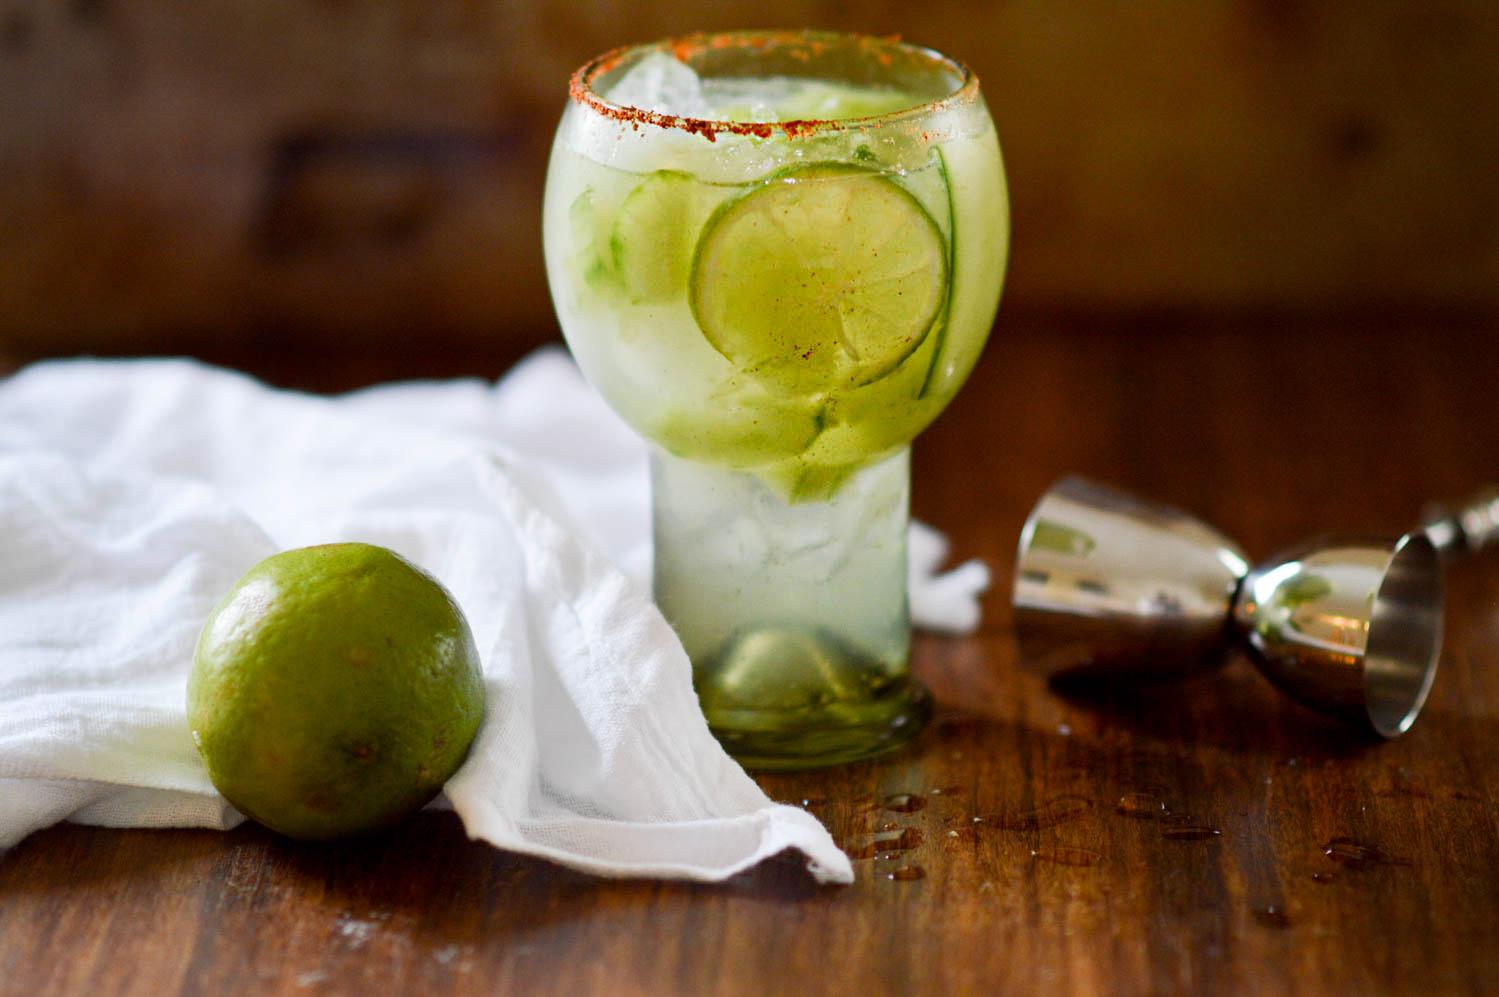 Spicy Cucumber Lime Margarita via. www.birdieshoots.com